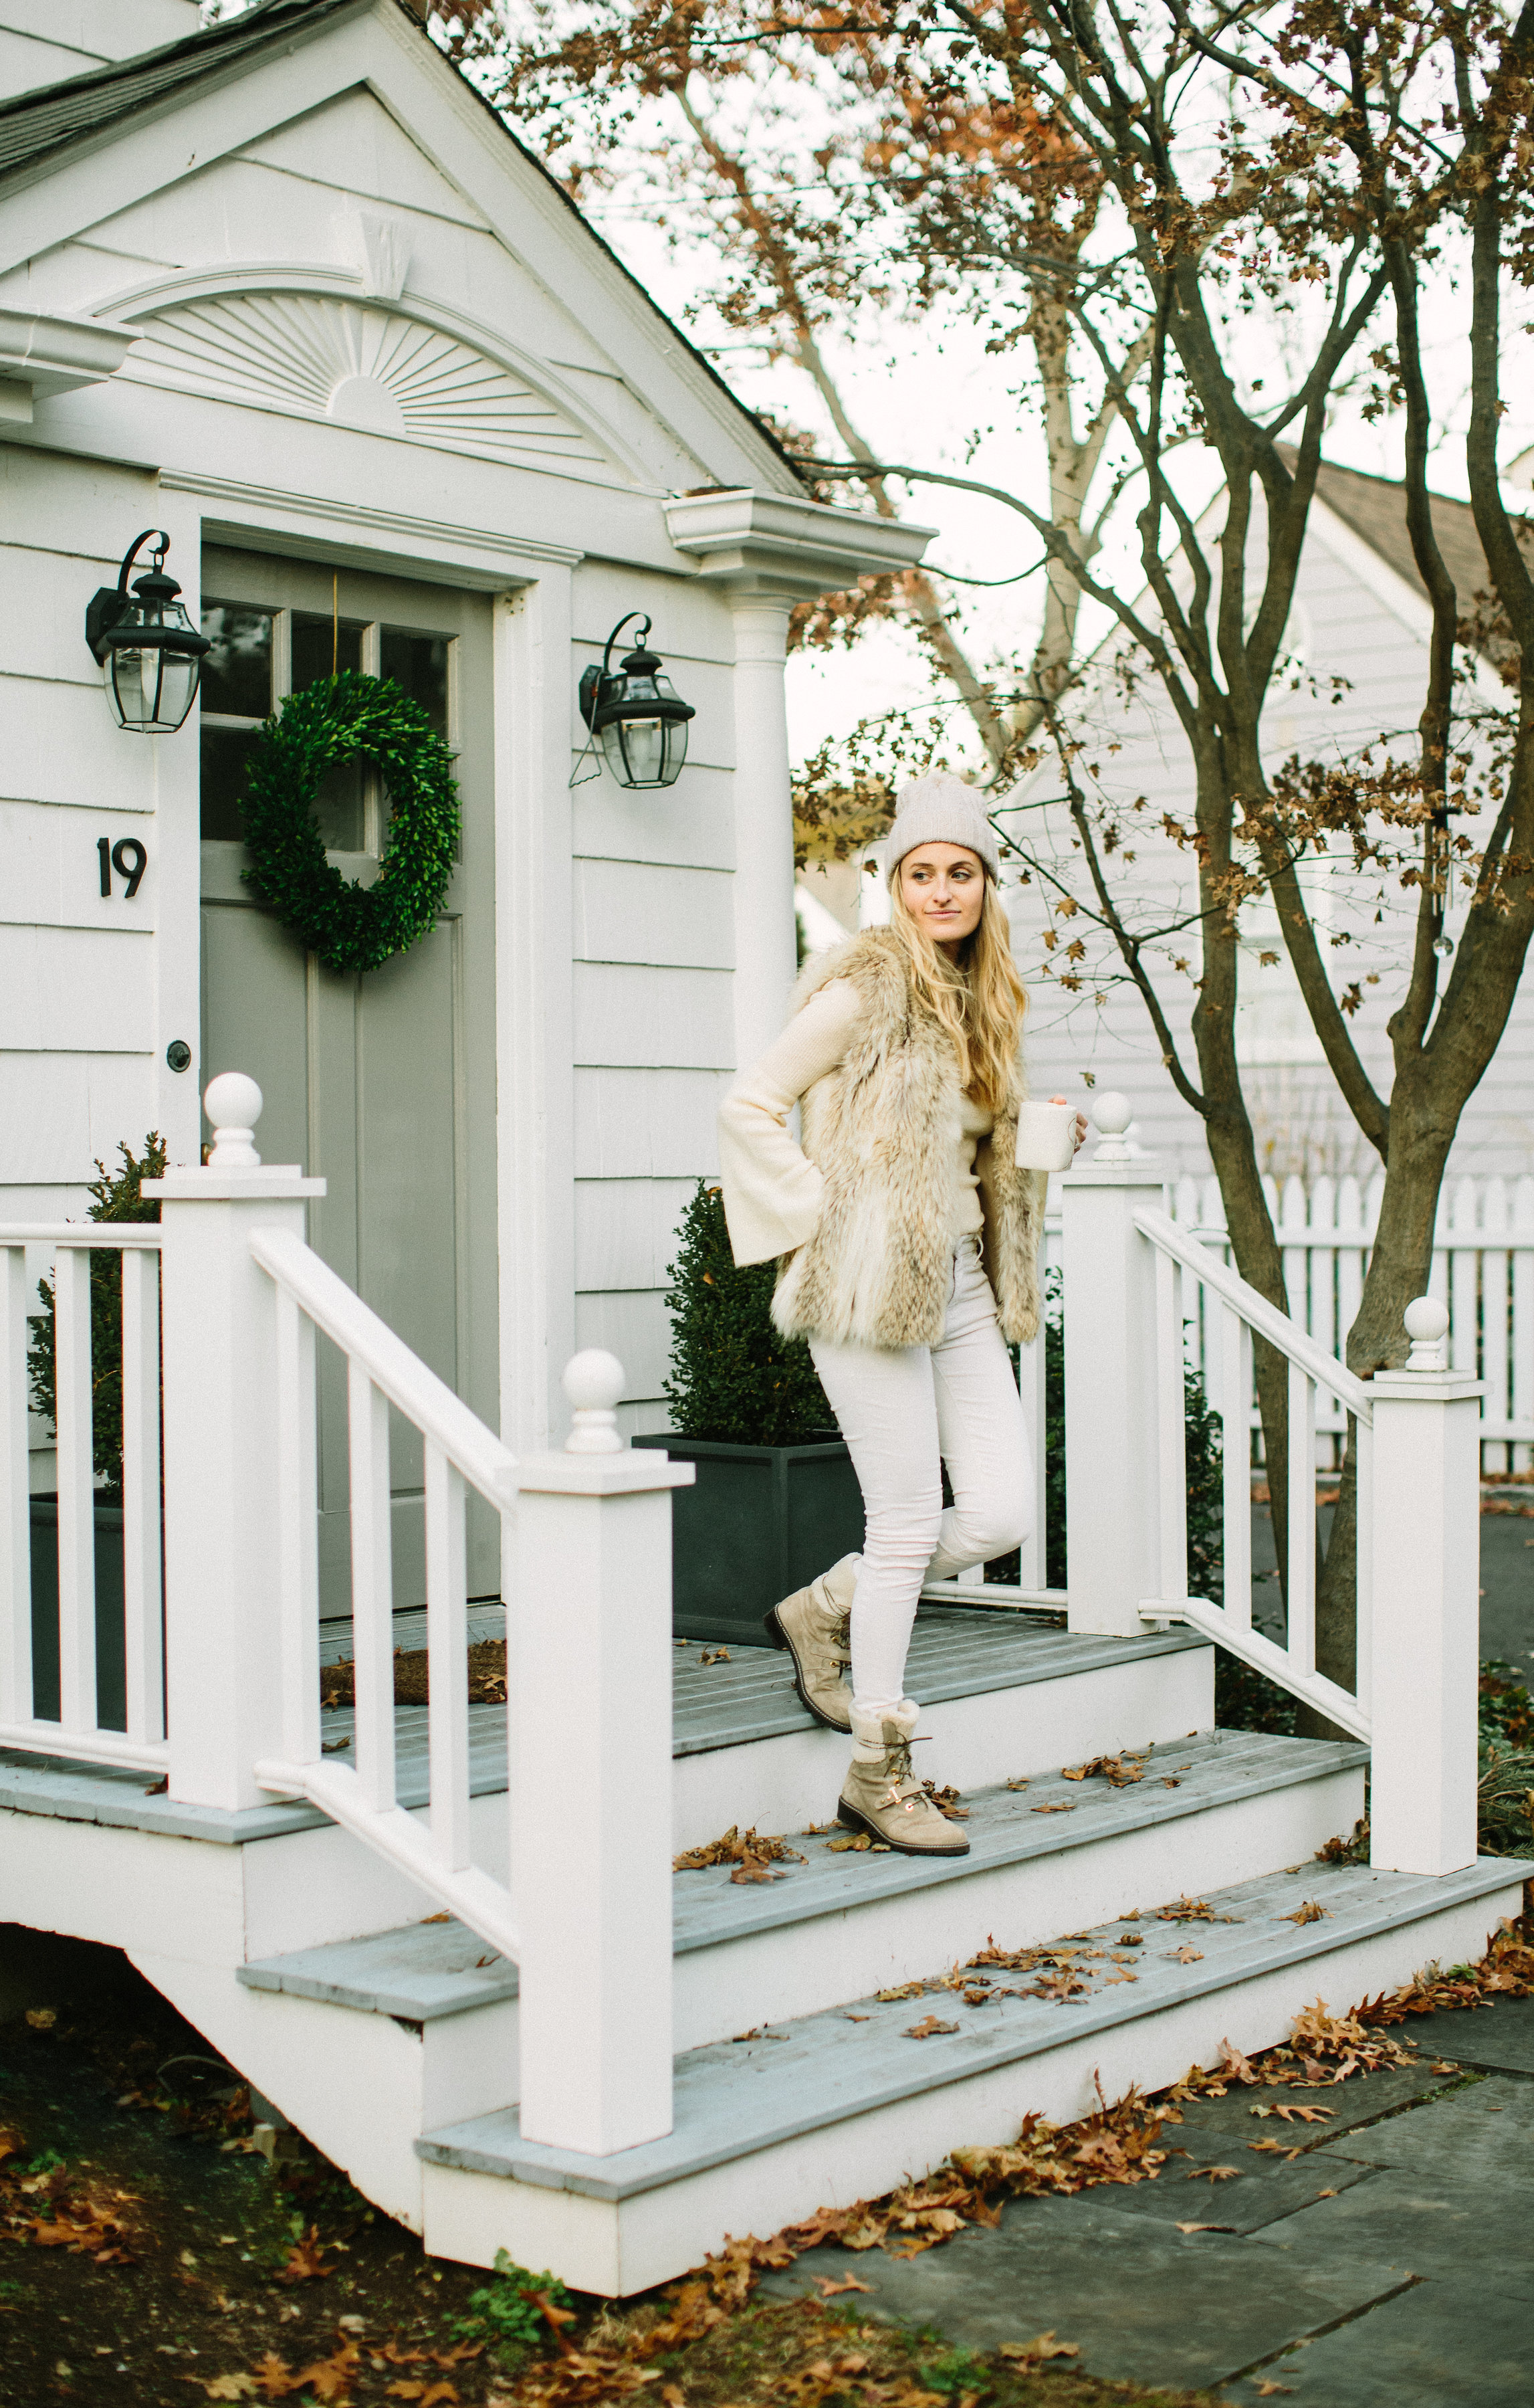 TheGirlGuide-StephanieTrotta-LindsayMaddenPhotography-19.jpg